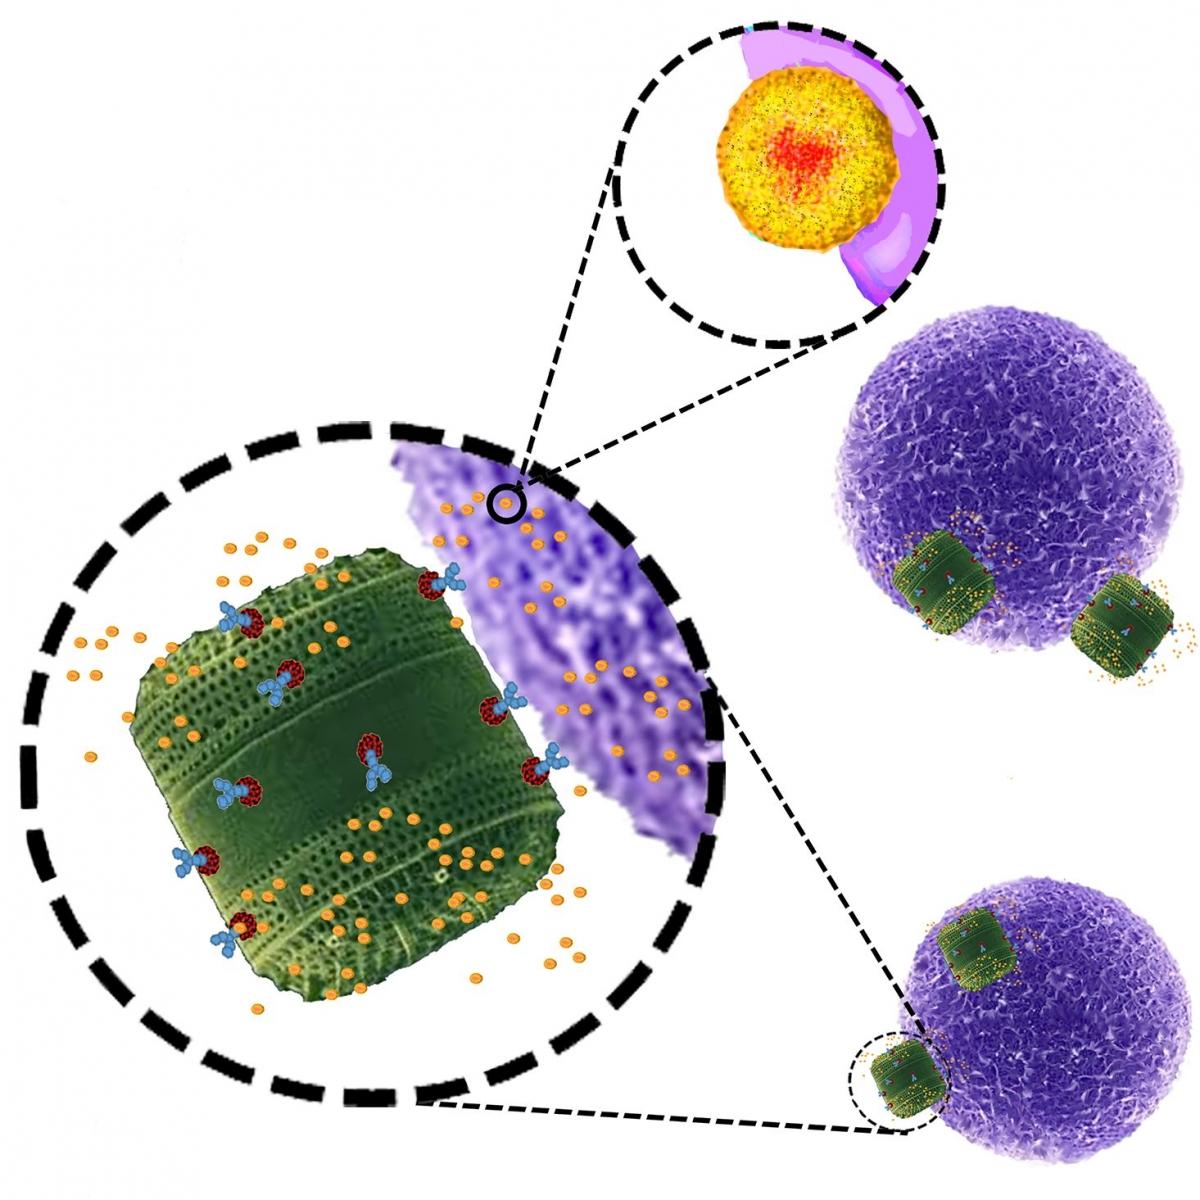 Genetically engineered diatom biosilica